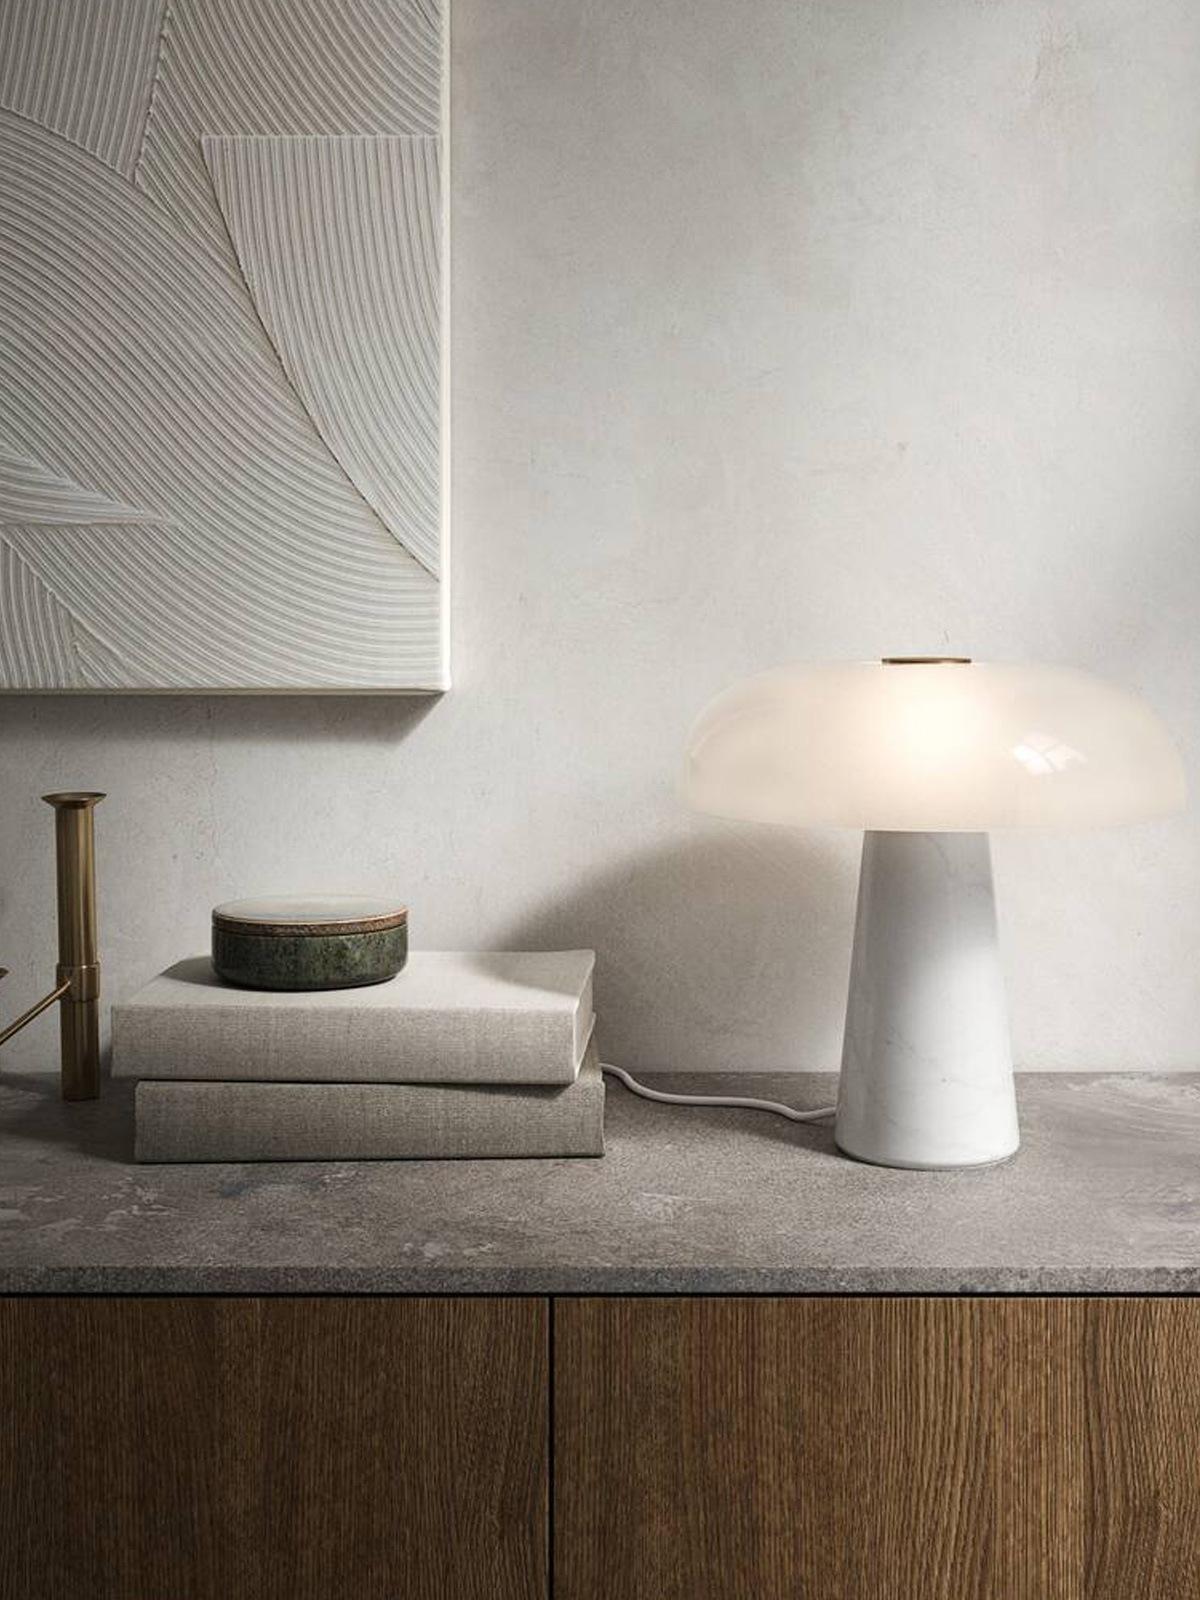 DesignOrt Lampenblog: Designer im Portrait: Maria Berntsen - Nordlux Glossy Design for the People Lampe Berlin